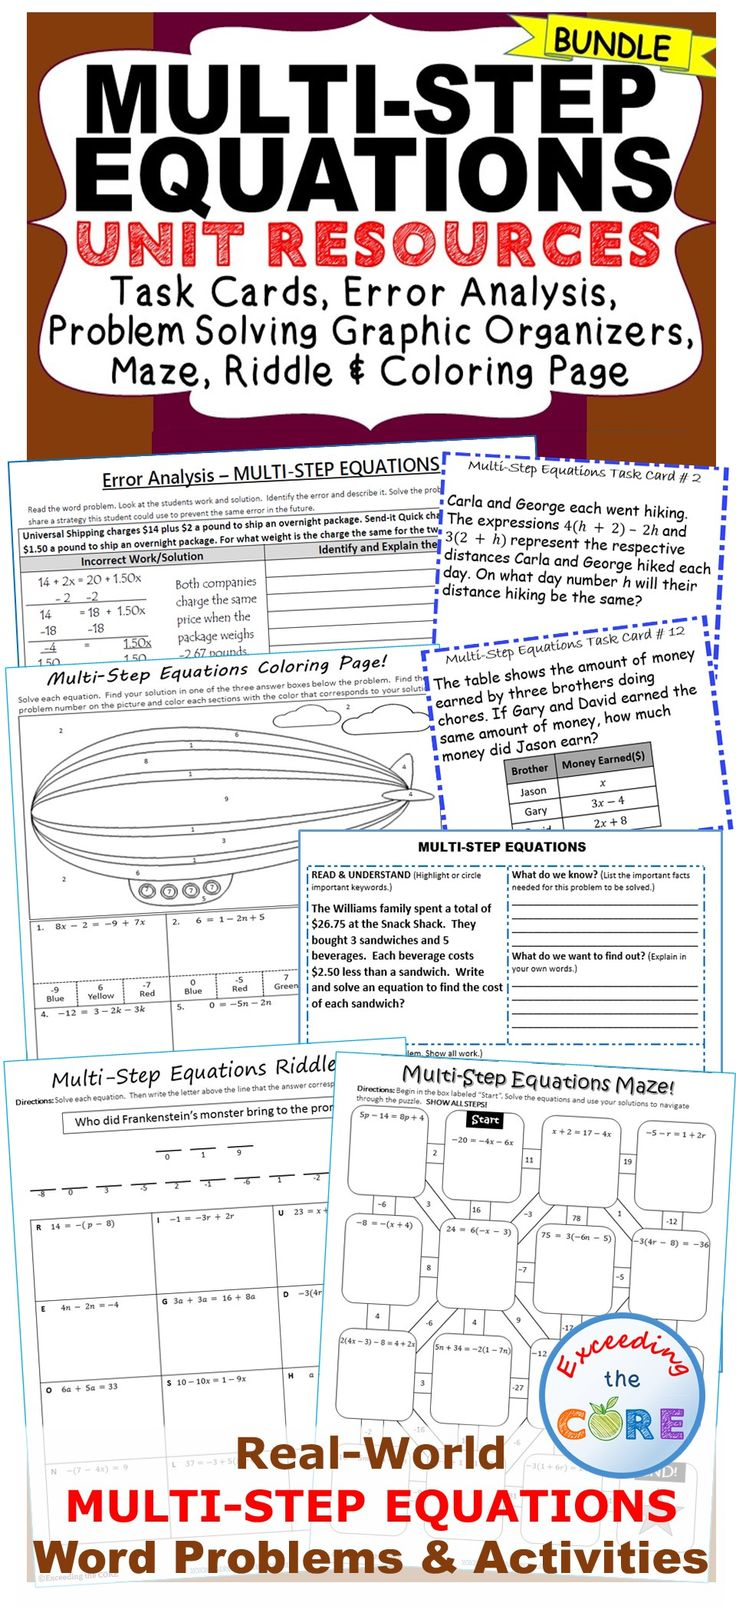 medium resolution of MULTI-STEP EQUATIONS BUNDLE - Task Cards